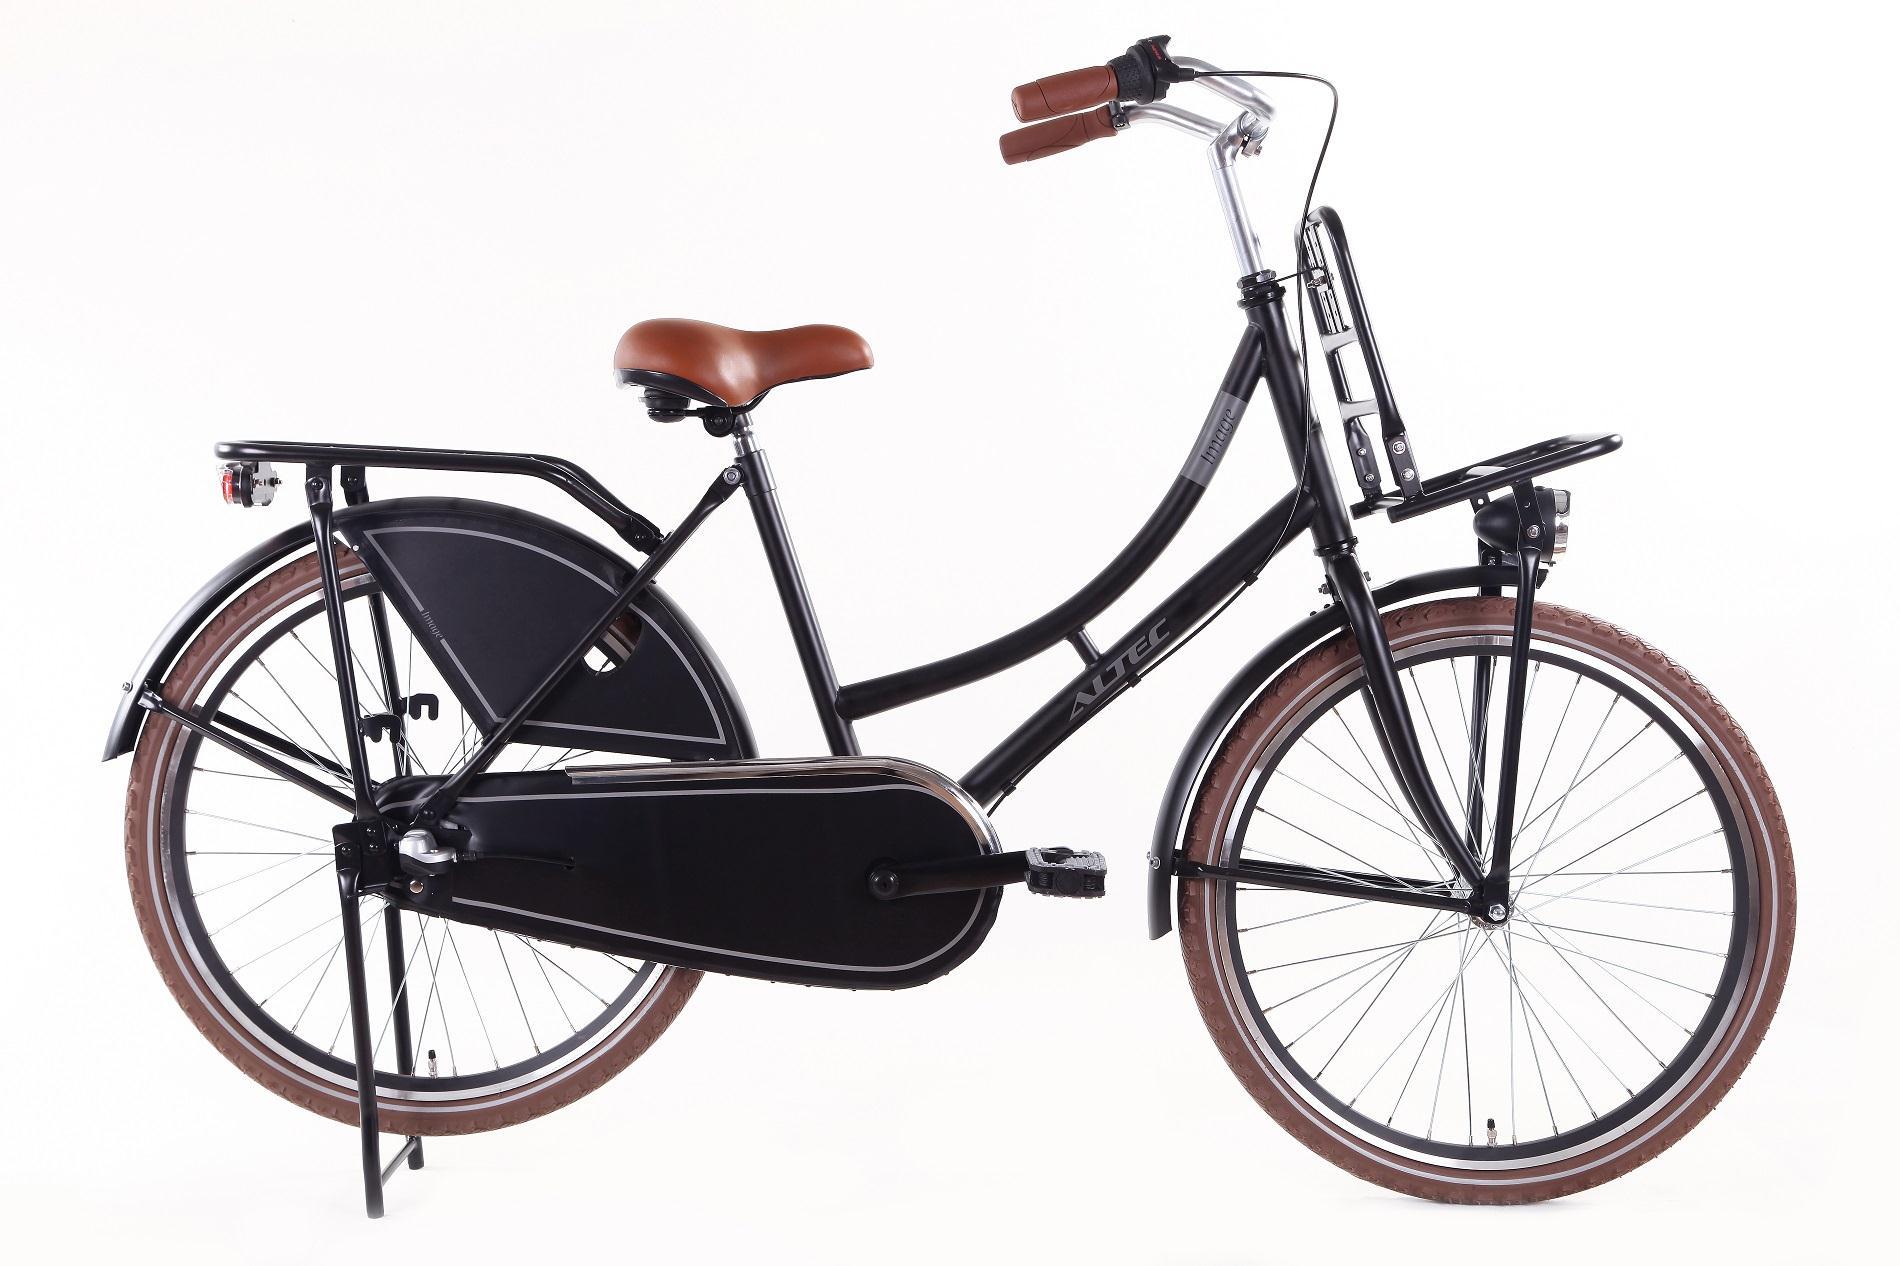 juni 2014 das hollandrad kultiges fahrrad f r stadt. Black Bedroom Furniture Sets. Home Design Ideas